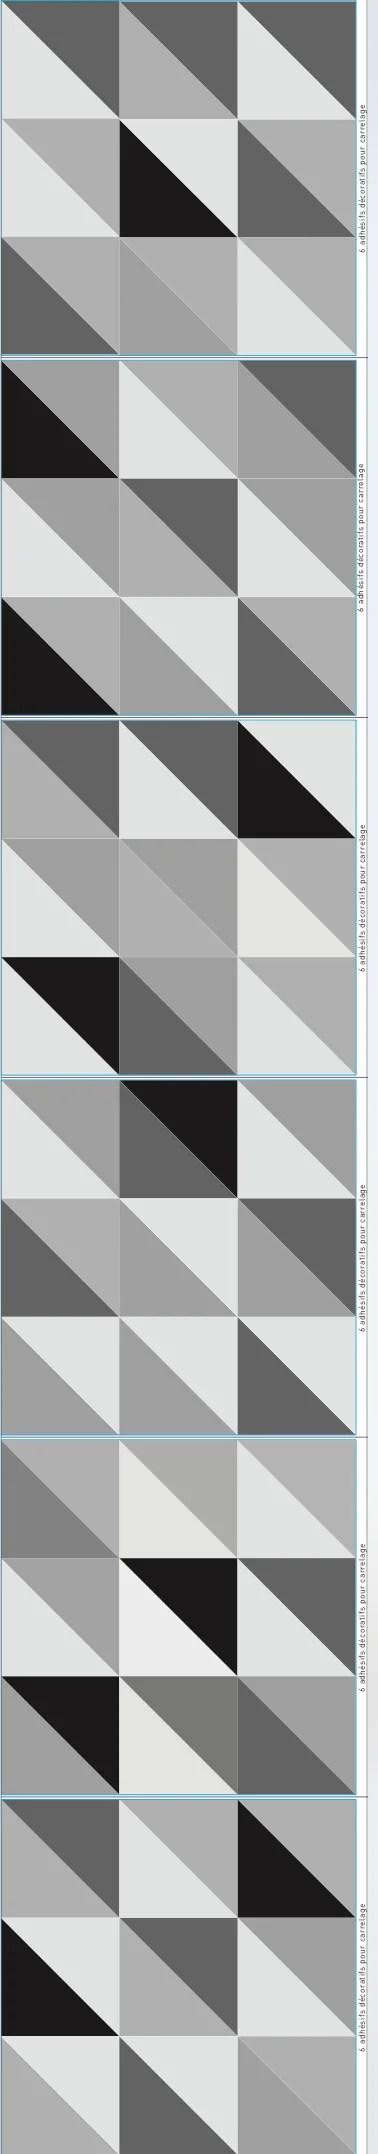 Lot De 6 Stickers Adhesifs Carrelage Mural Scandinave Noir Blanc 15 Cm X 15 Cm Leroy Merlin